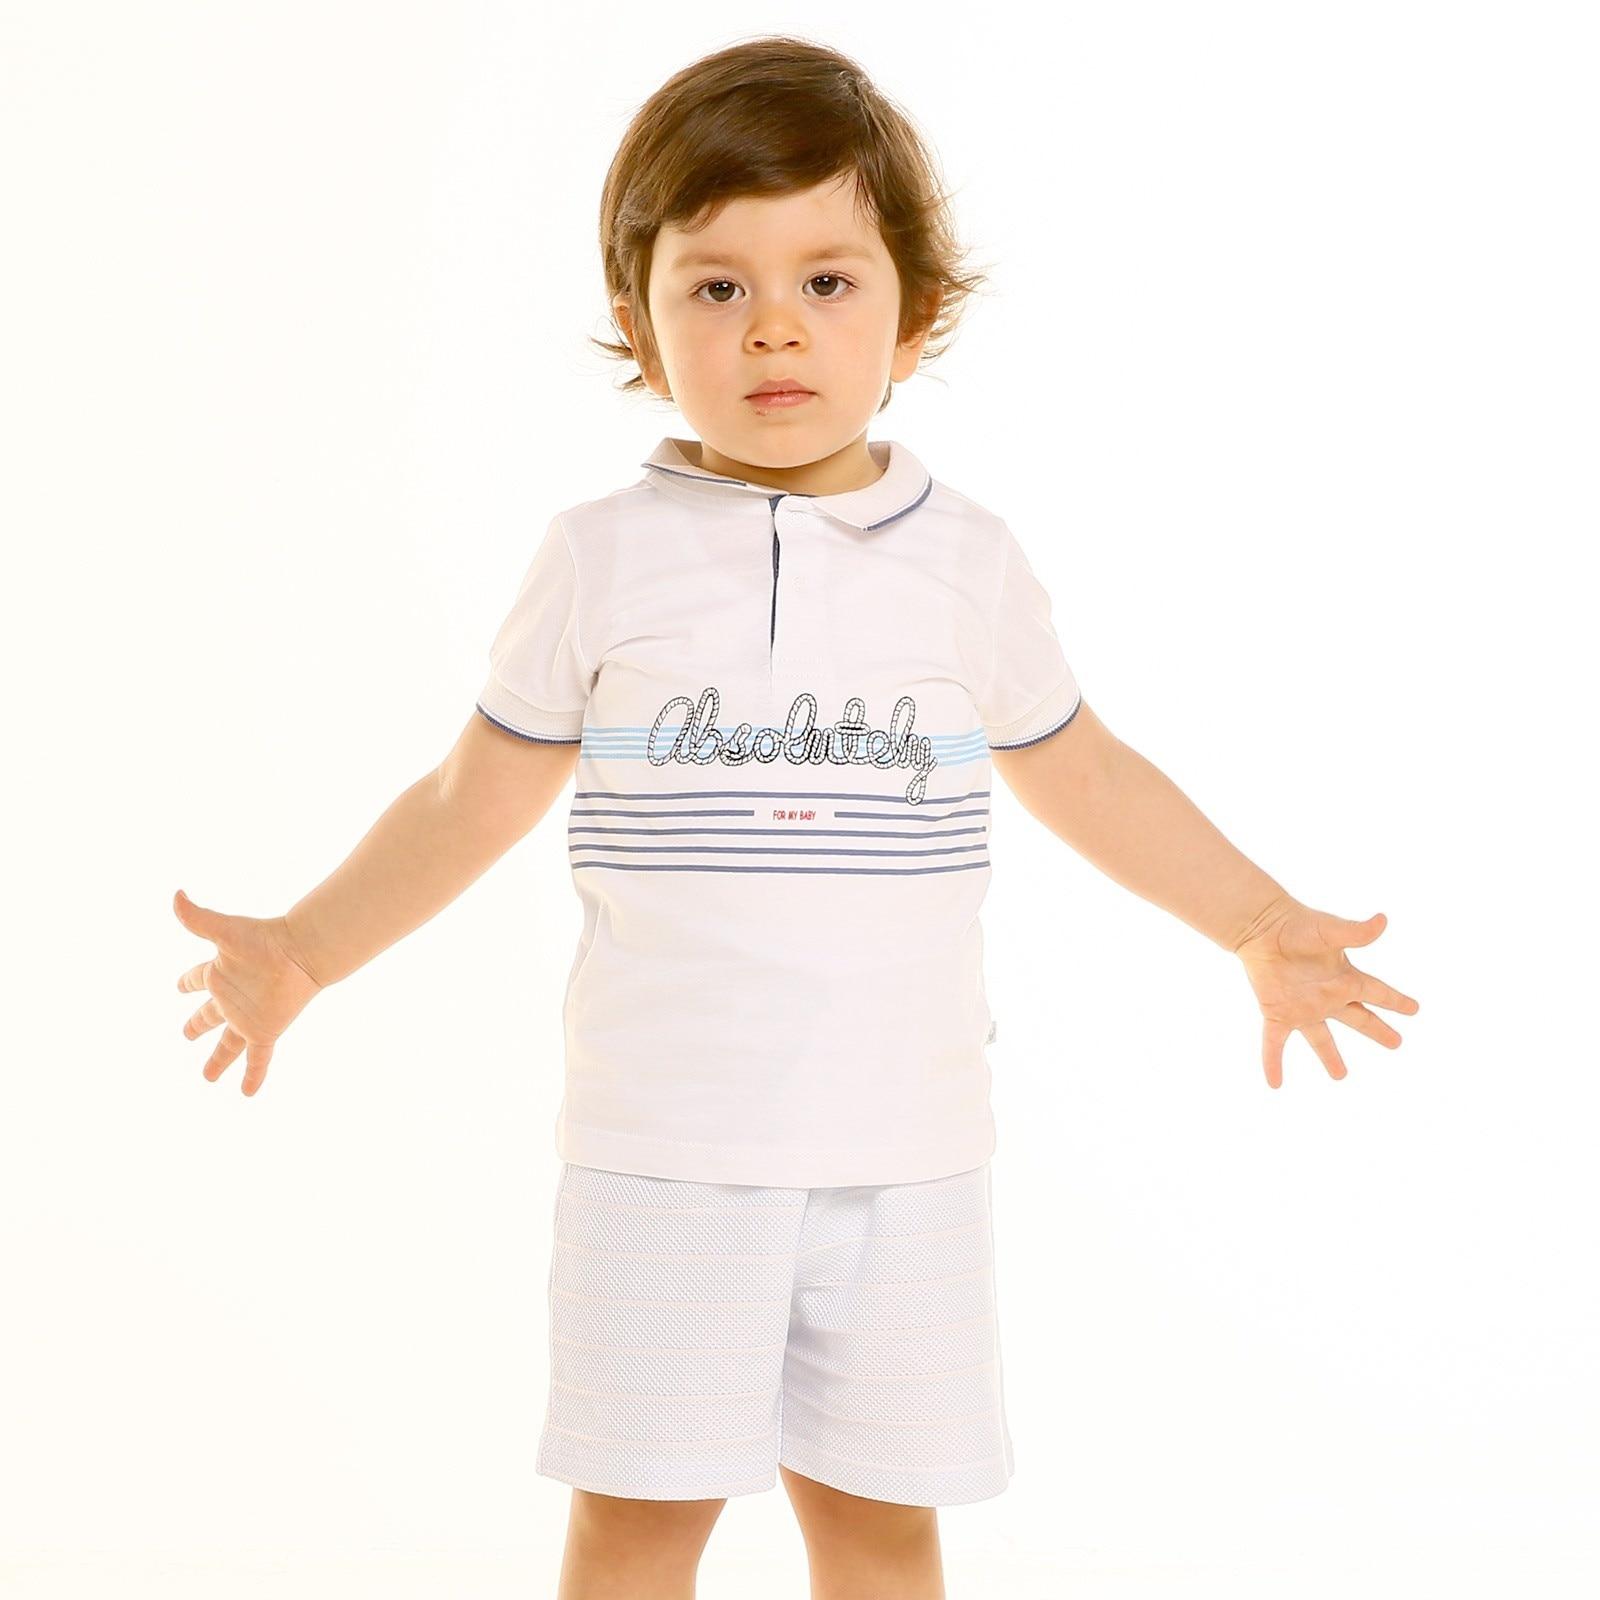 Ebebek For My Baby Boy Marin Polo Neck Tshirt Short Set